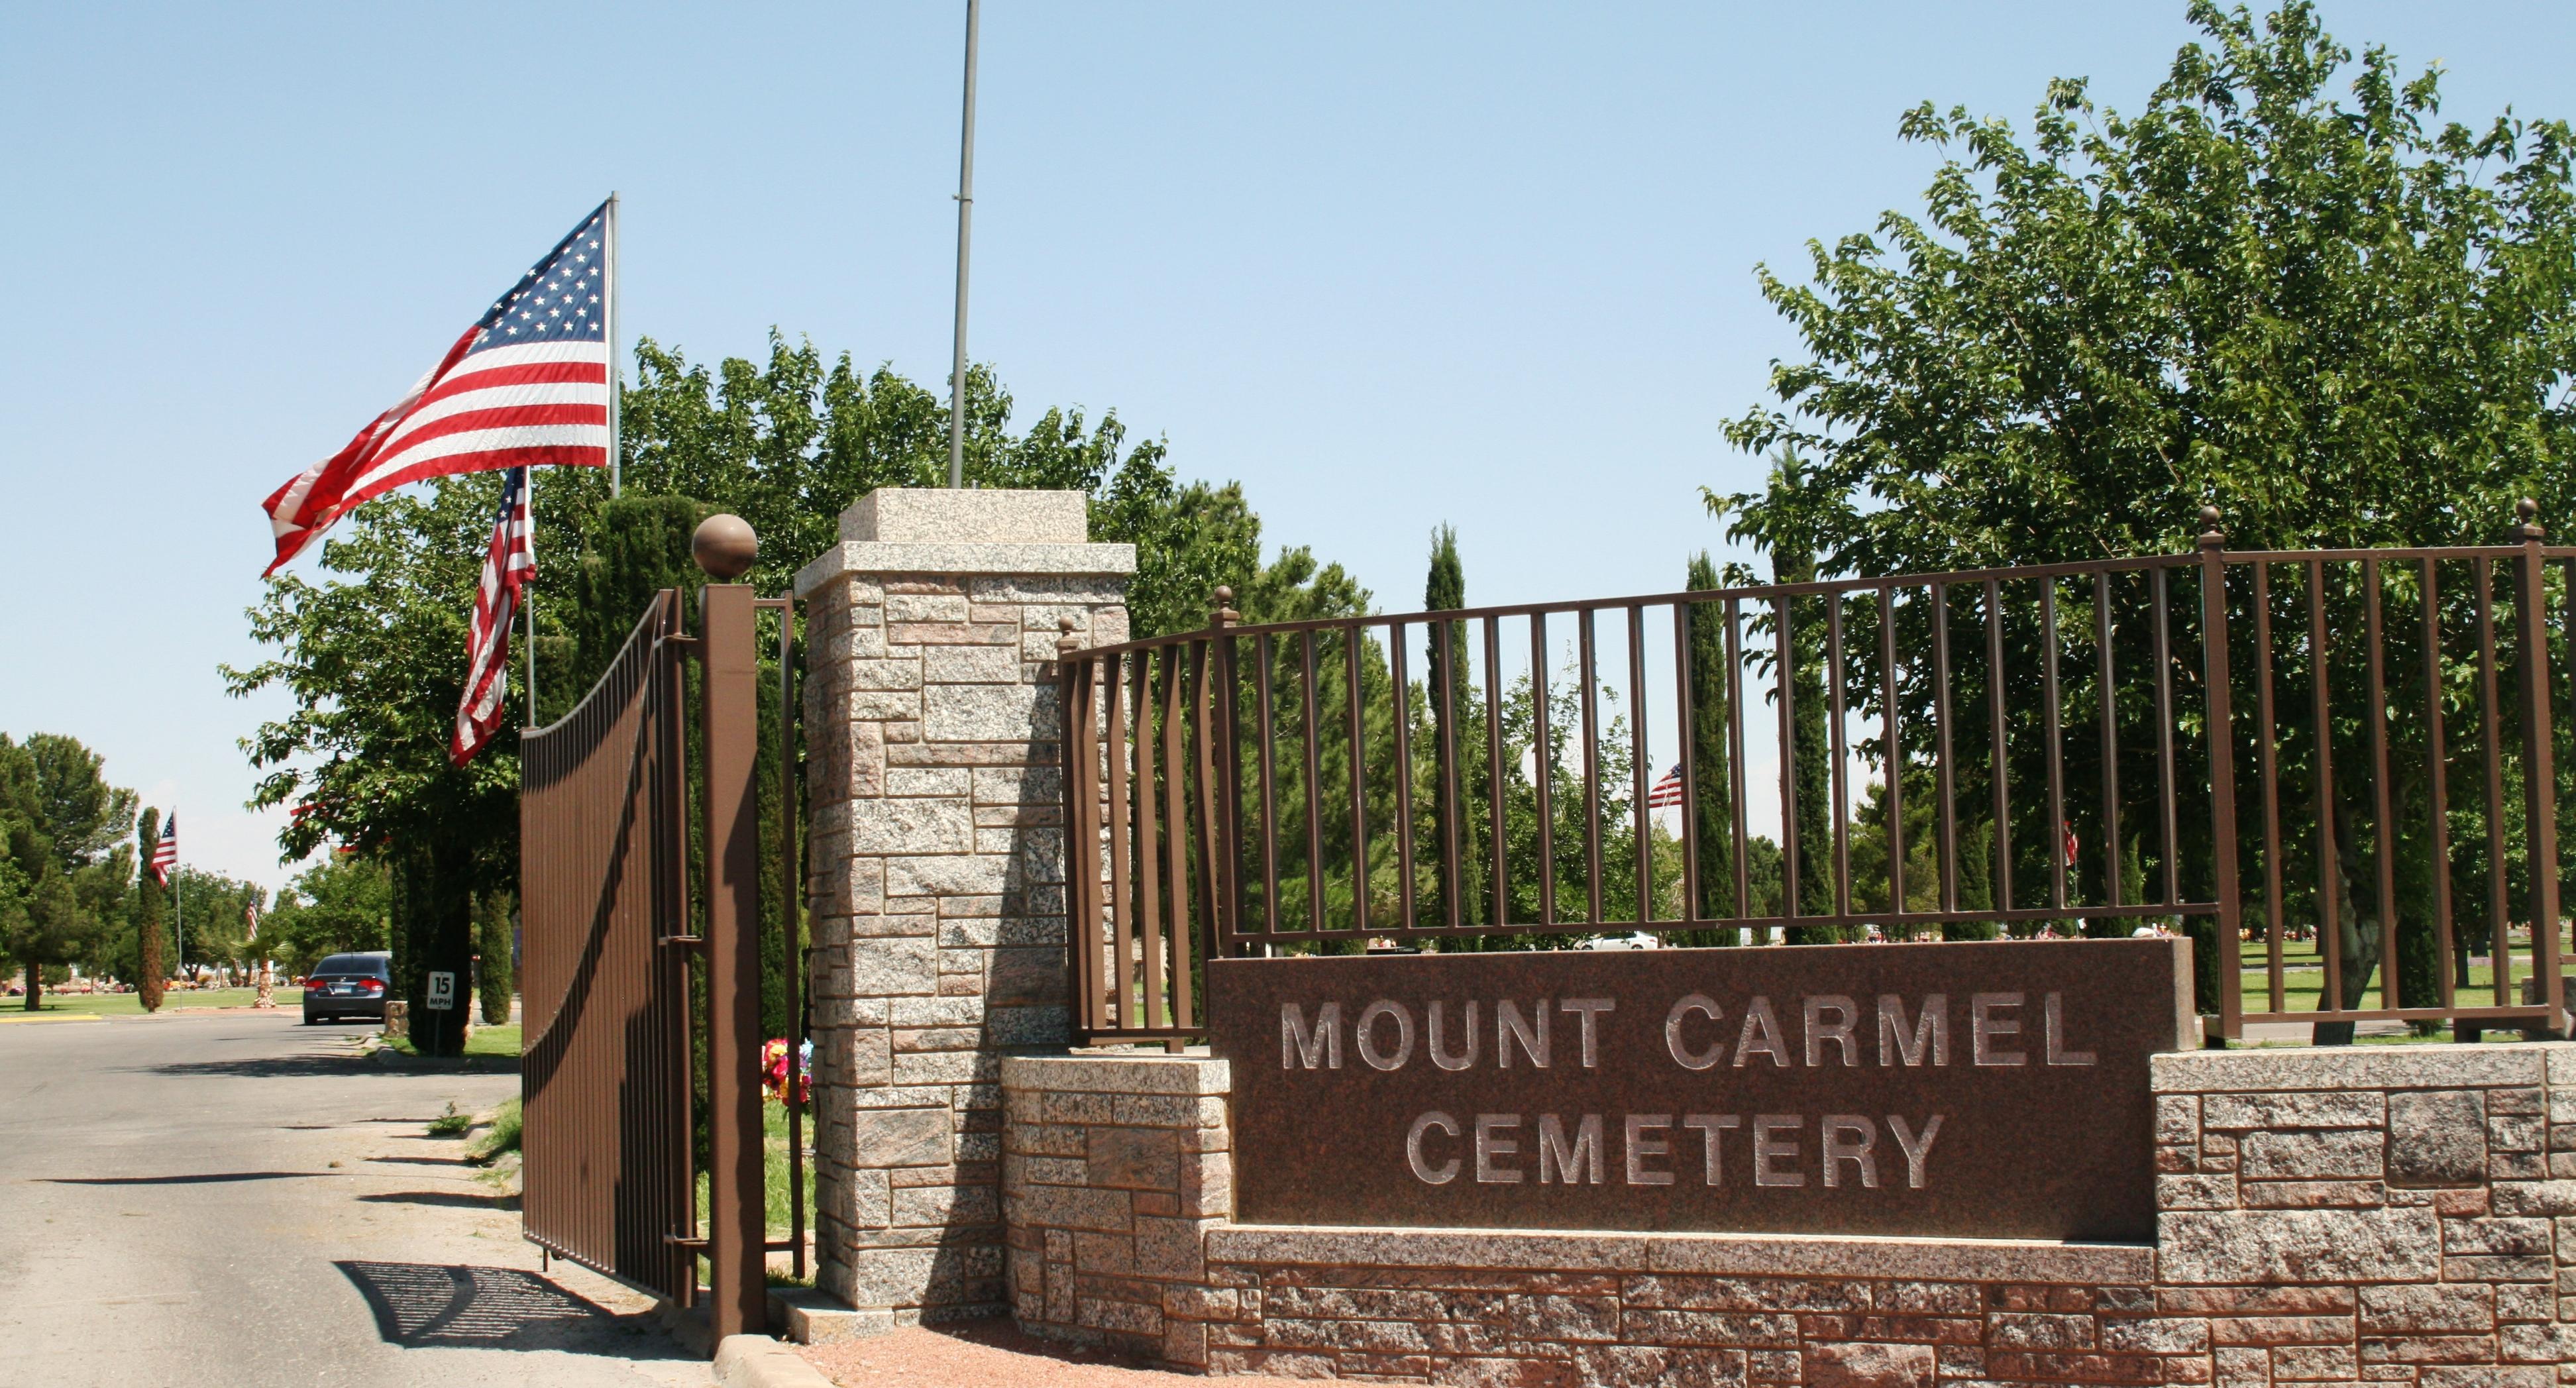 Mount Carmel Cemetery in El Paso, Texas - Find A Grave Cemetery